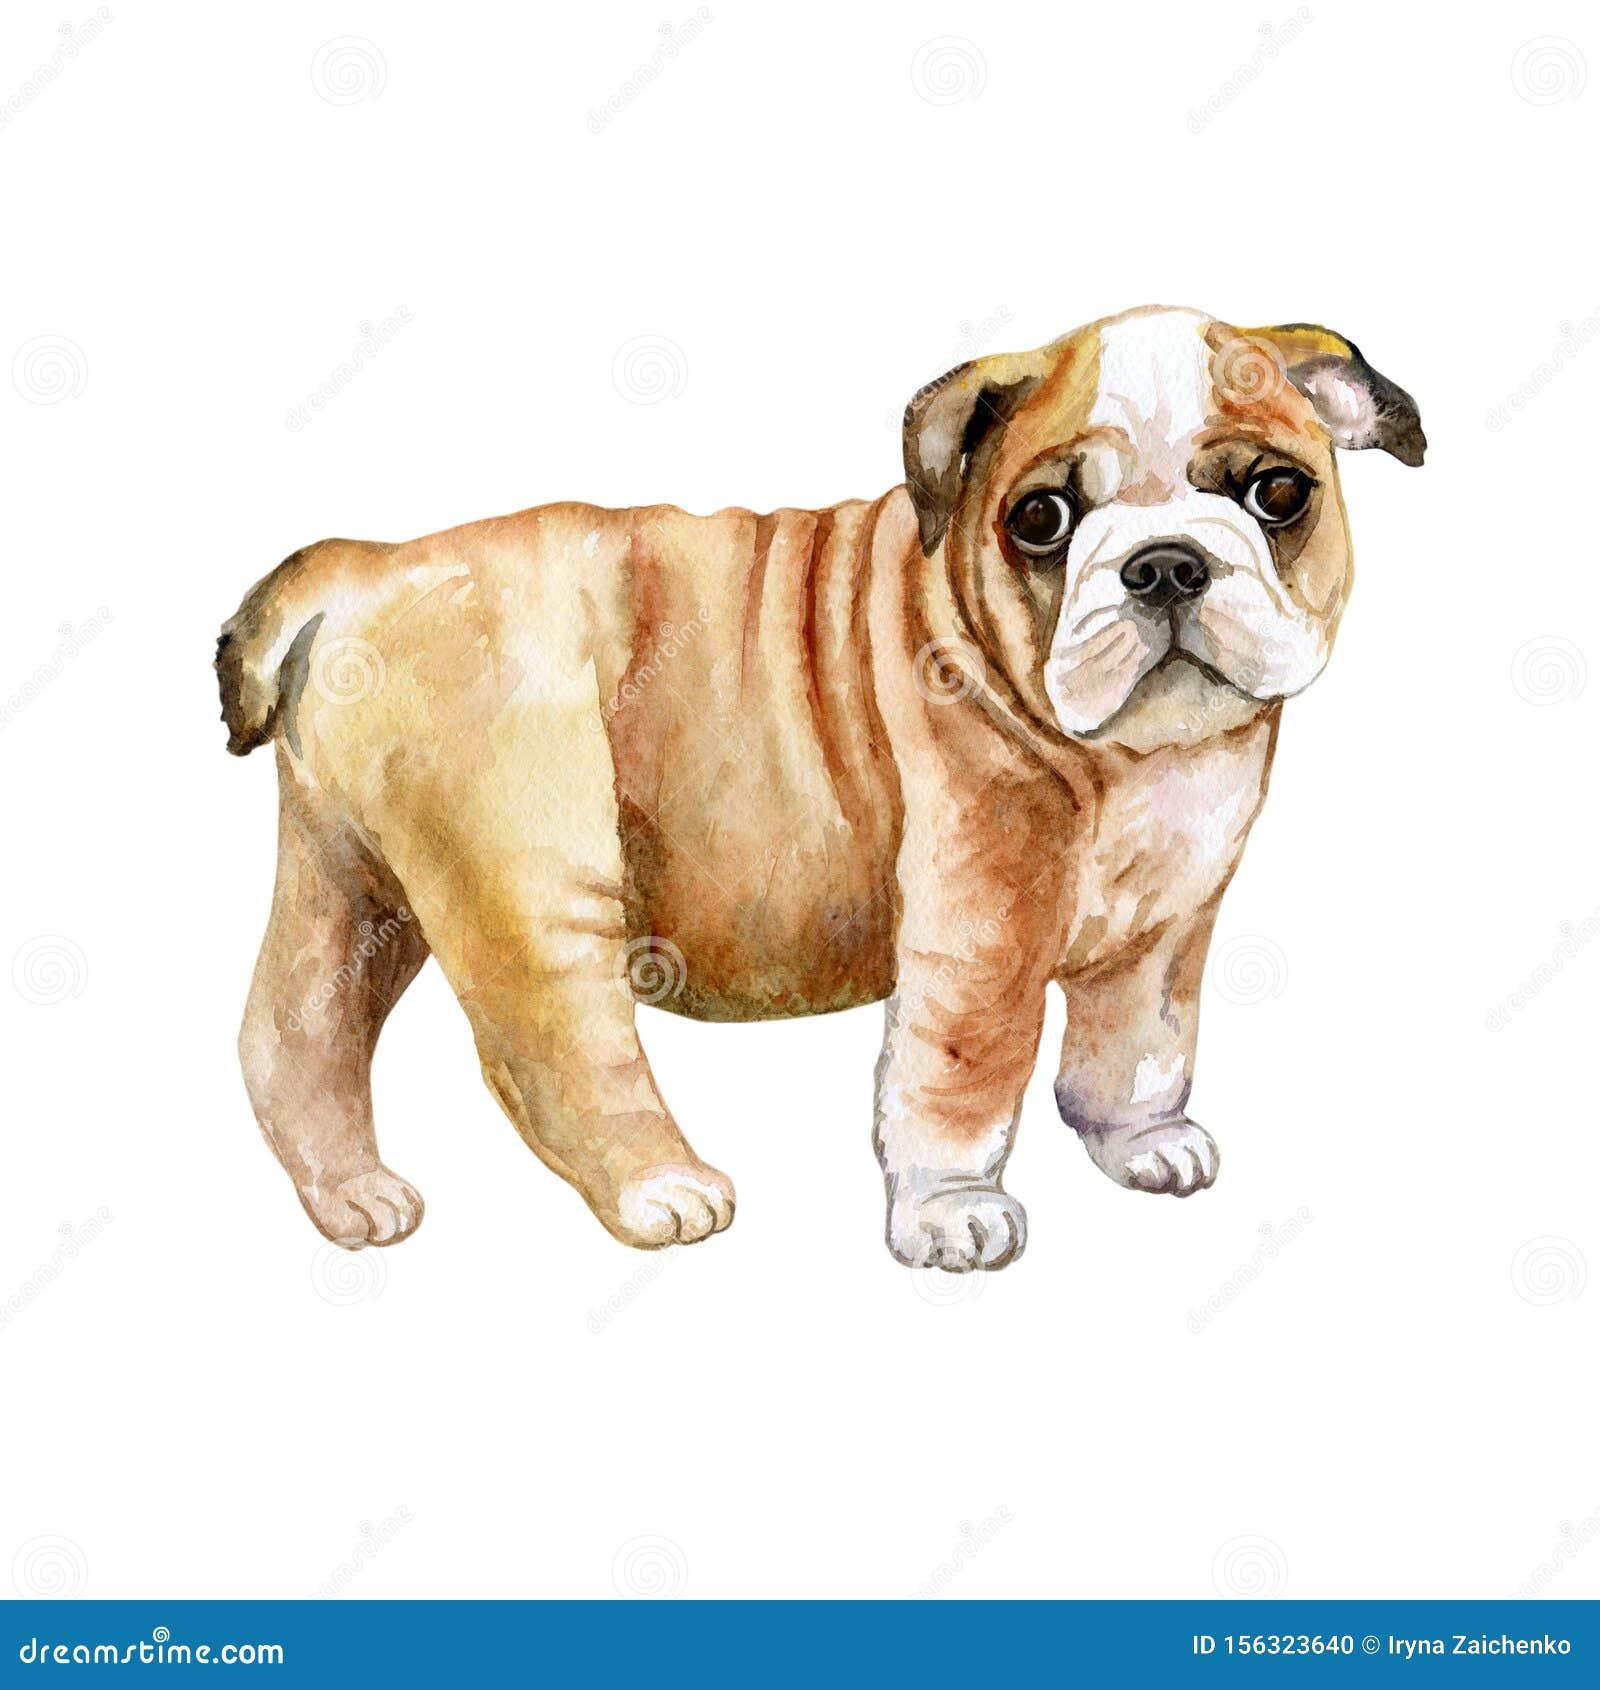 Watercolor English Bulldog Puppy Painting Stock Illustration Illustration Of Card Breed 156323640